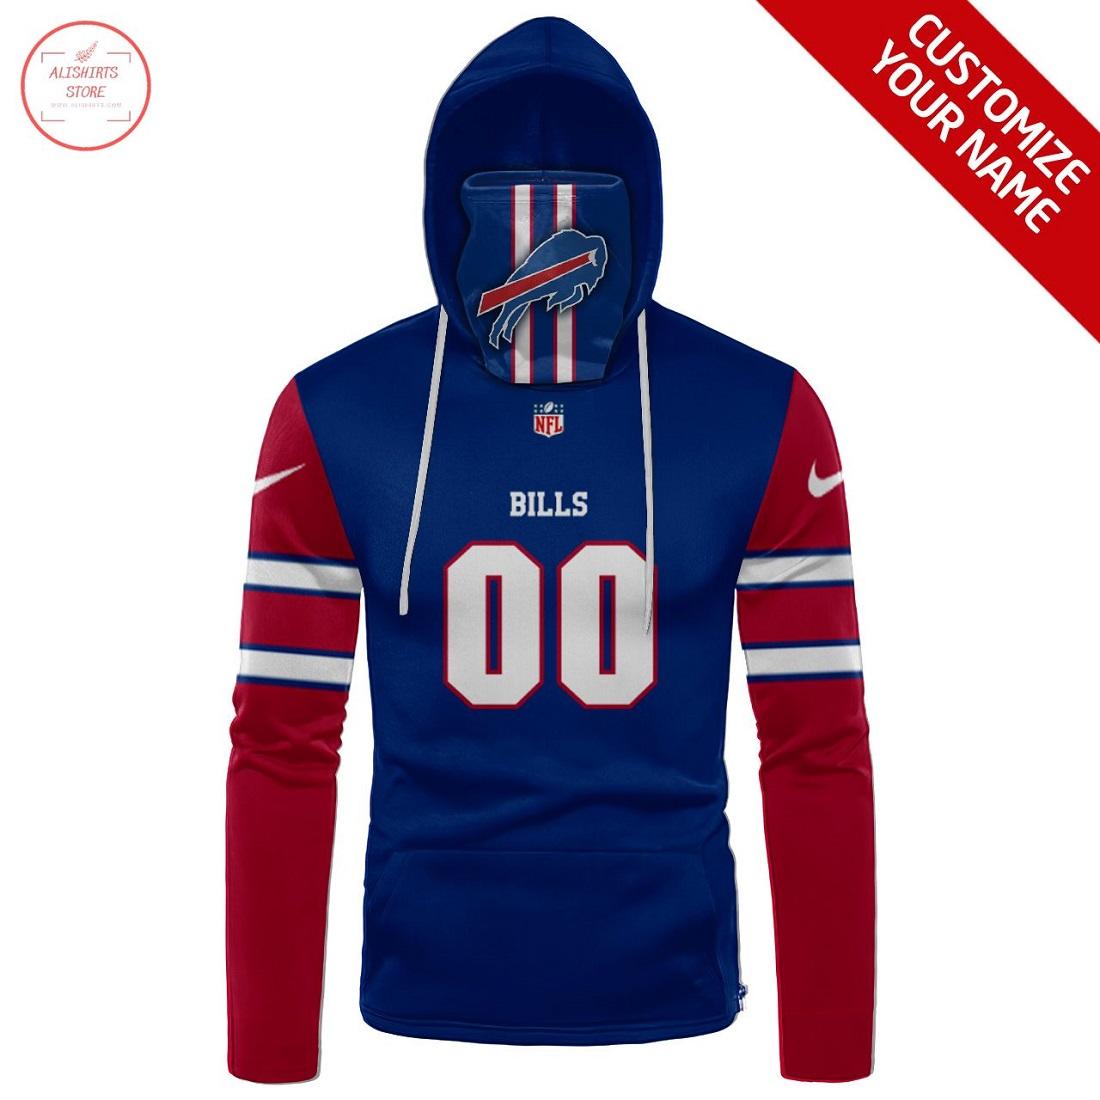 Custom name NFL Buffalo Bills Gaiter Hoodie